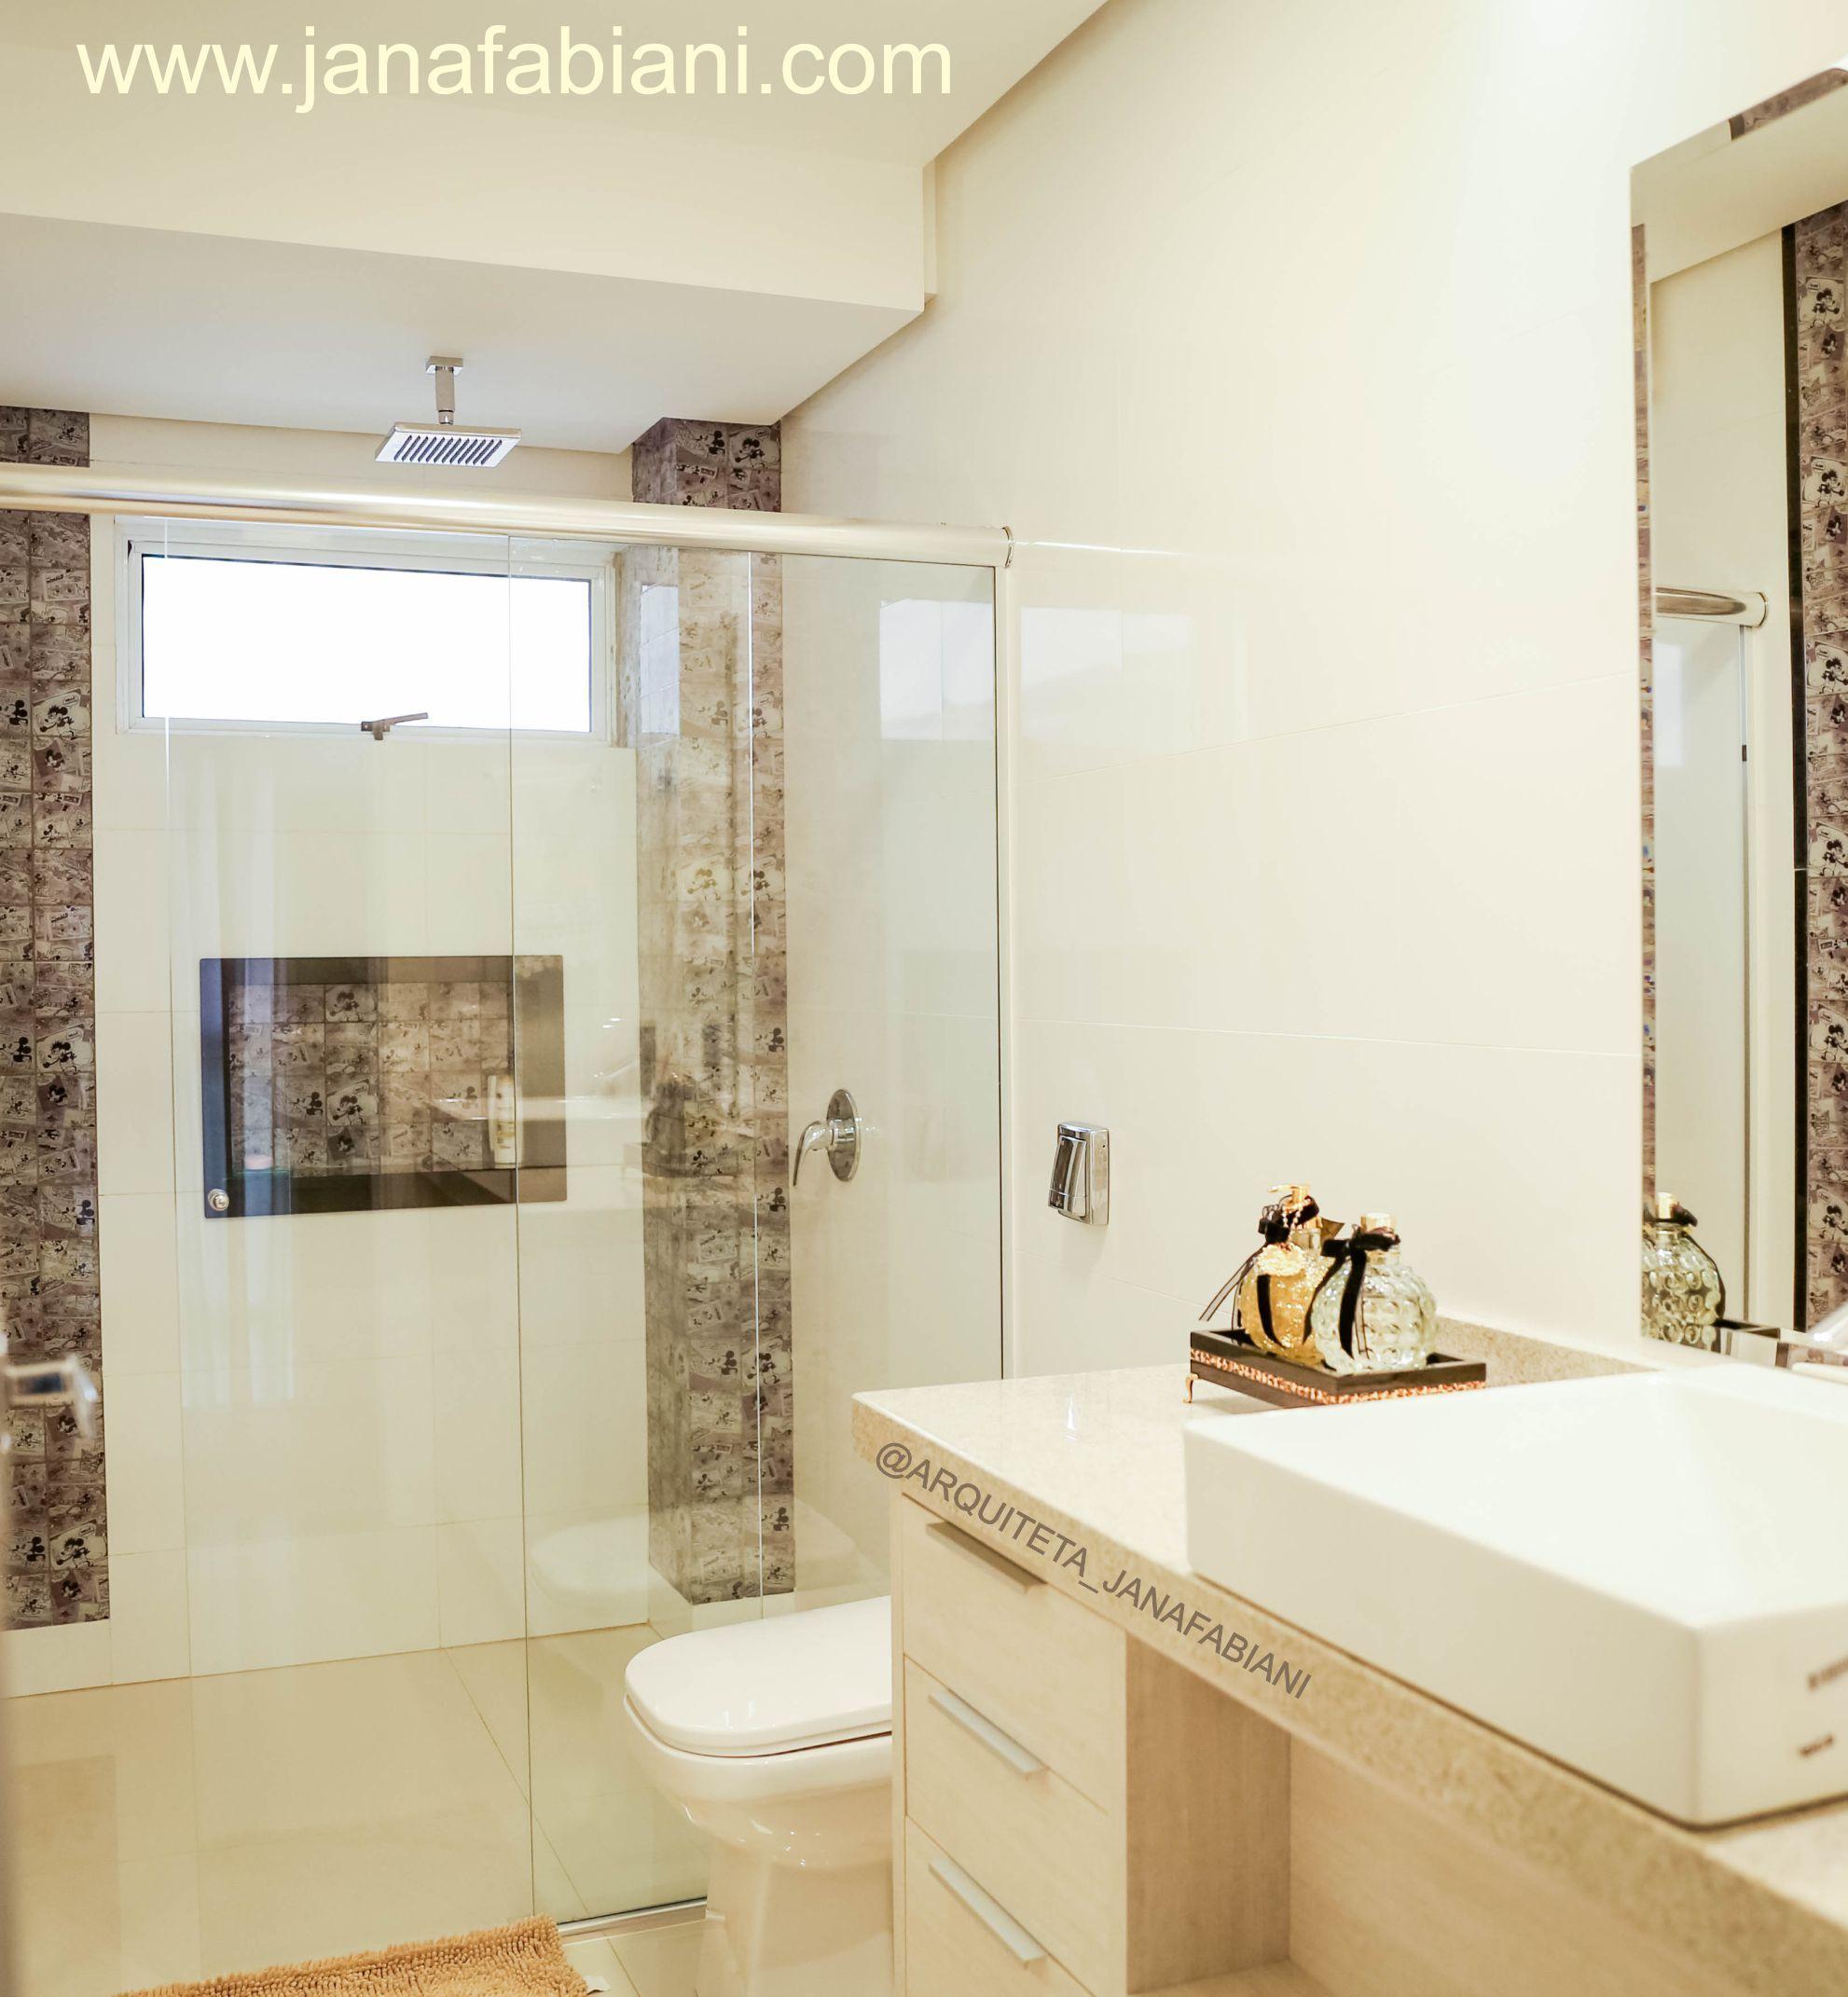 Banheiro, pastilha mickey, banheiro clean  DECOR sobmedida  Jana Fabiani   -> Banheiro Clean Com Pastilha